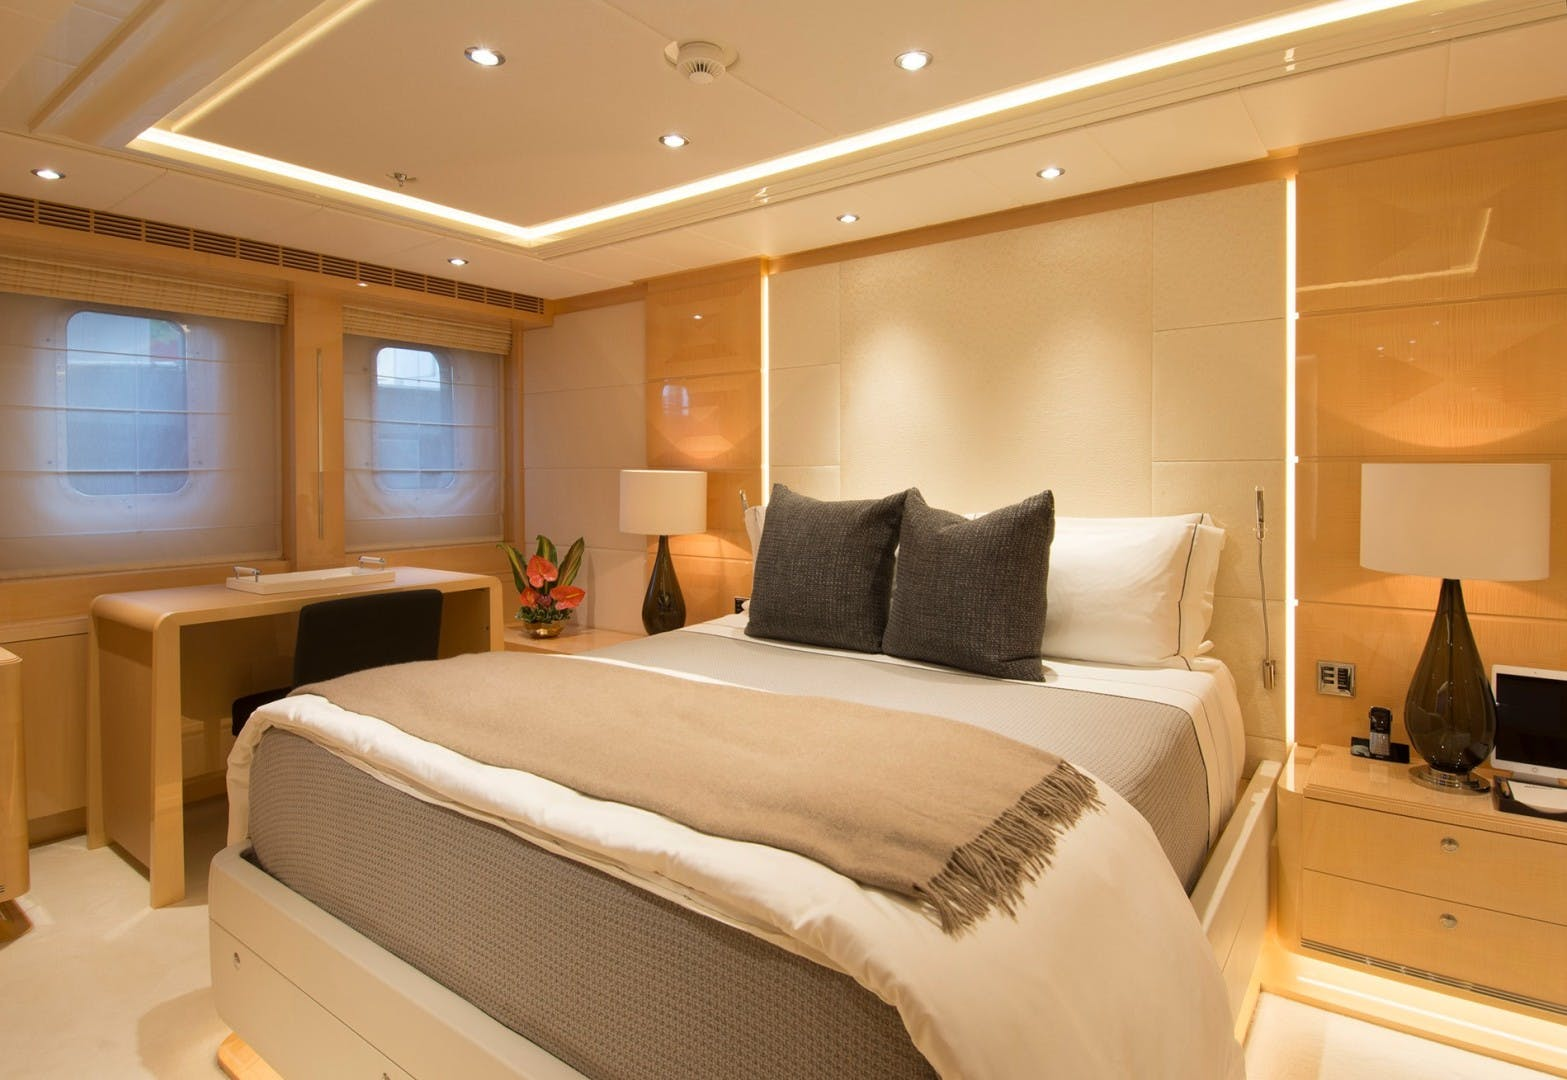 2011 Heesen Yachts 180' Lloyds, LY2/MCA Abbracci | Picture 2 of 11